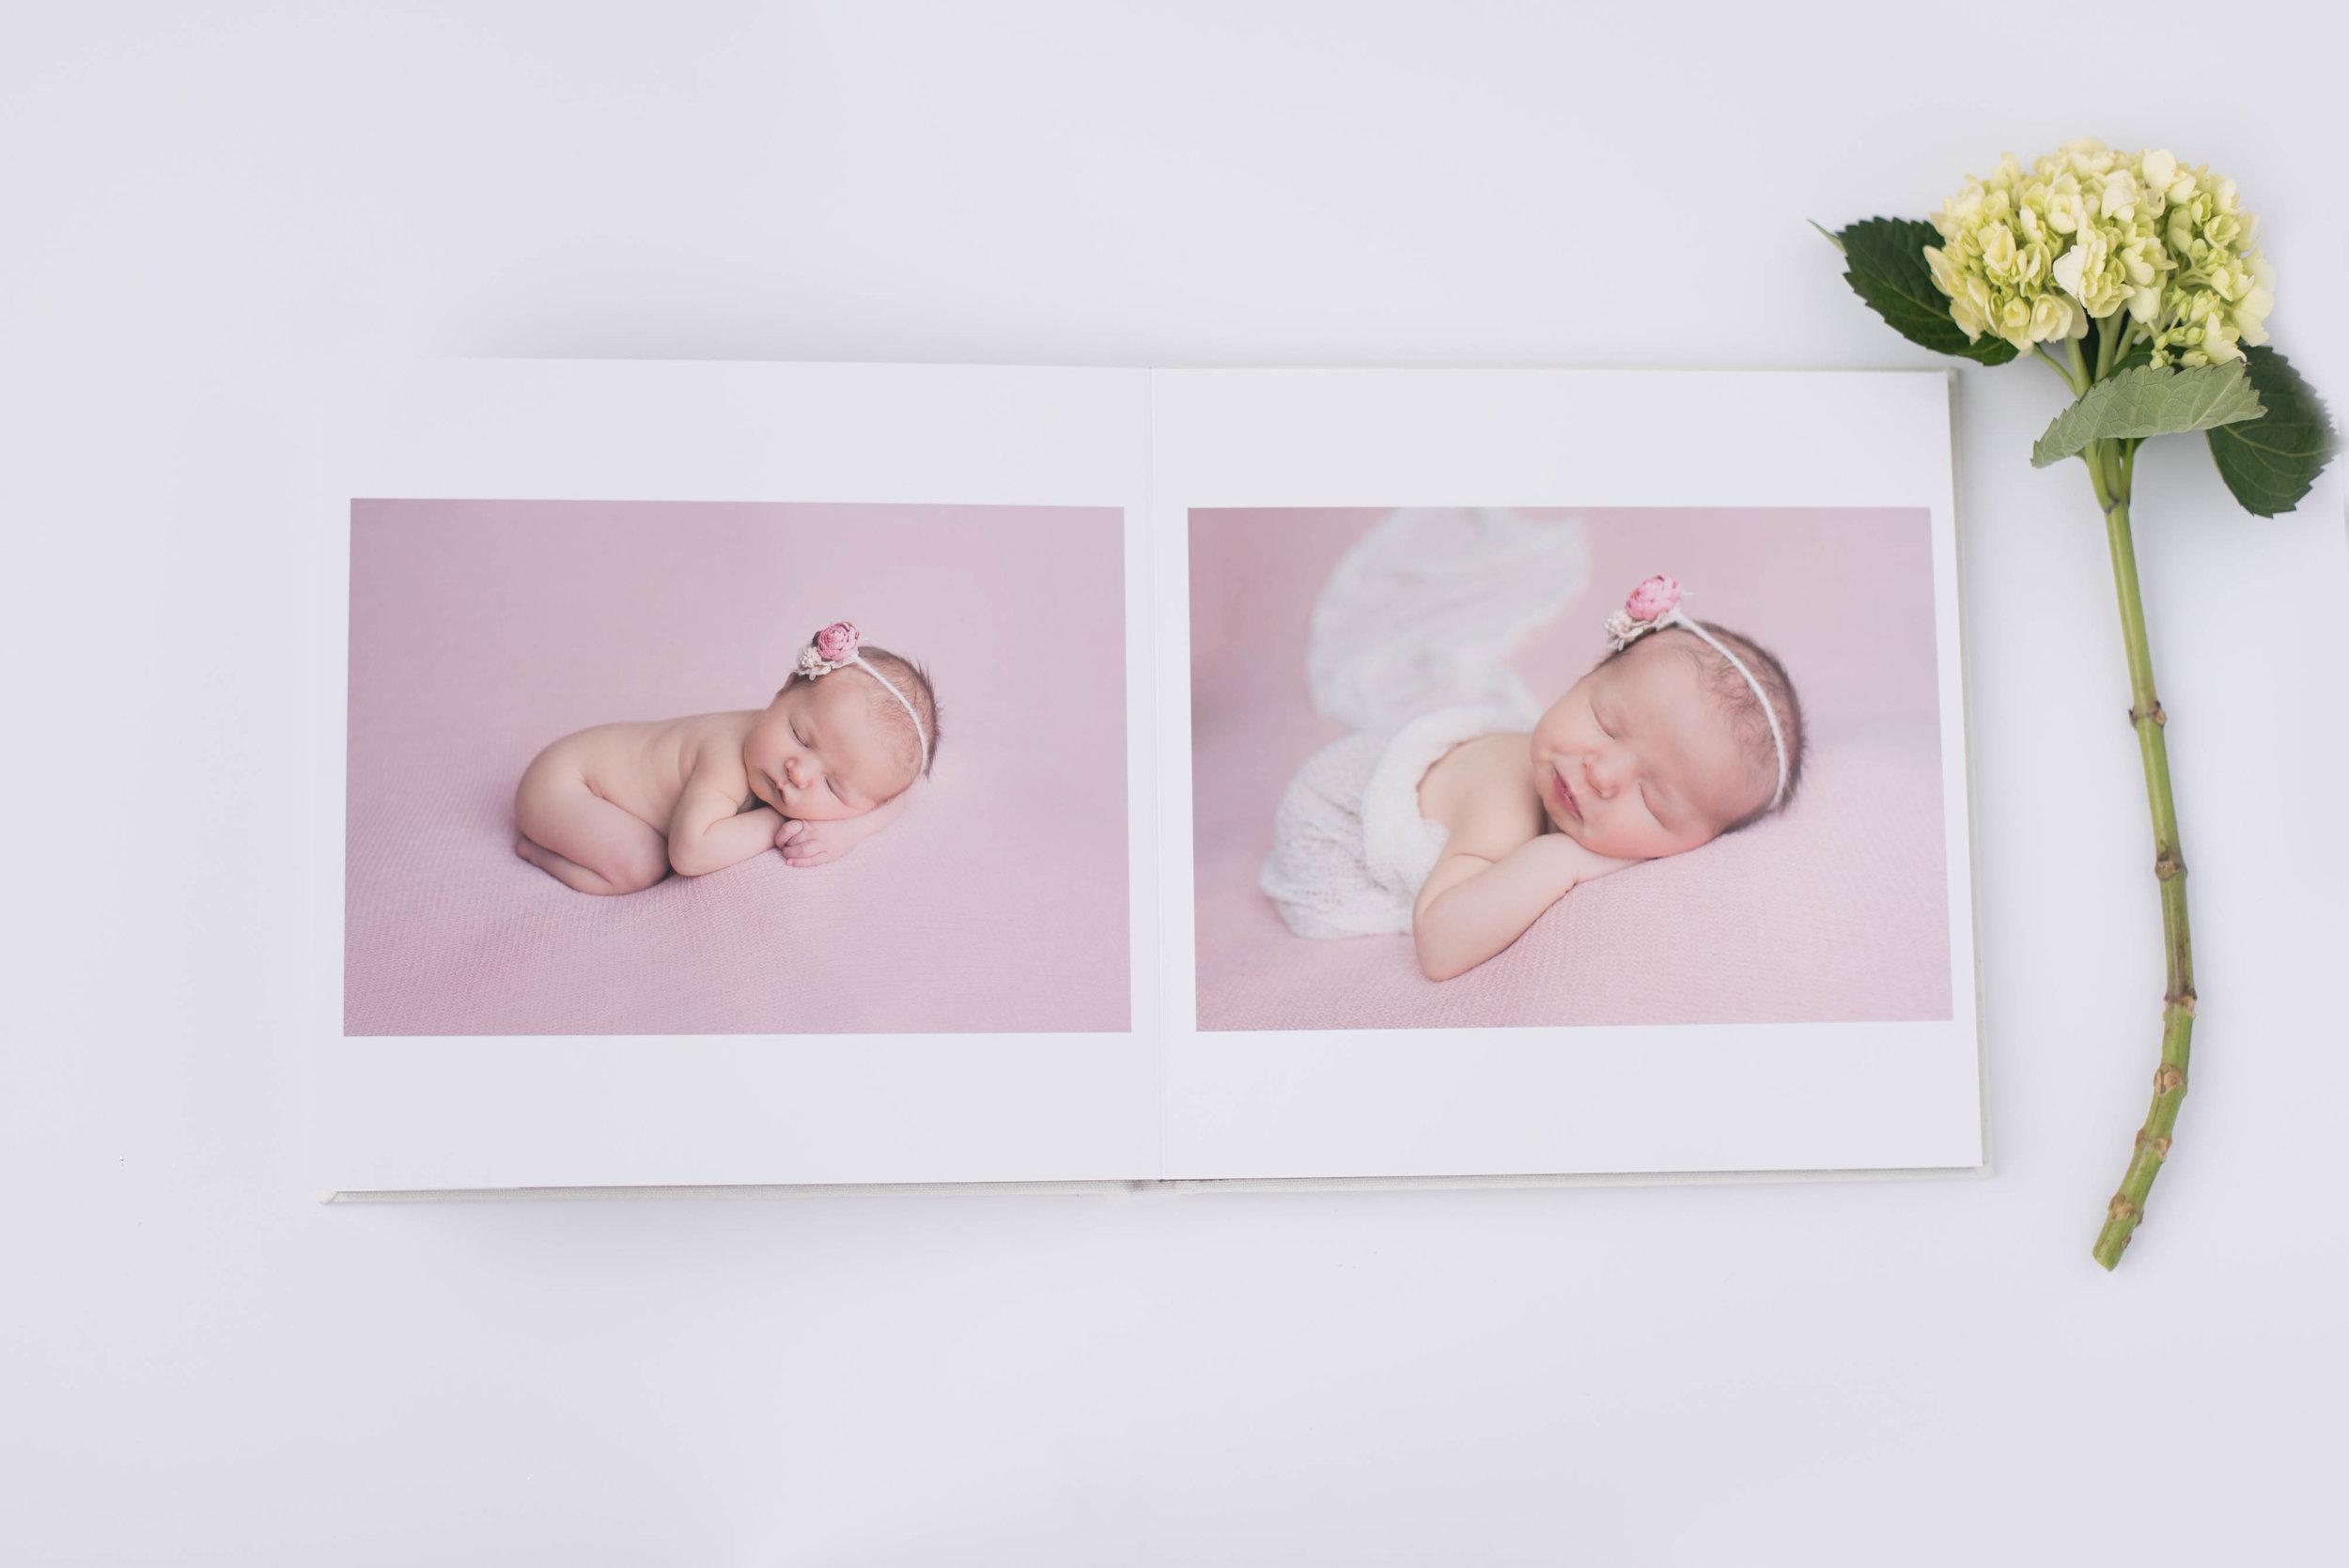 saratoga springs newborn photographer